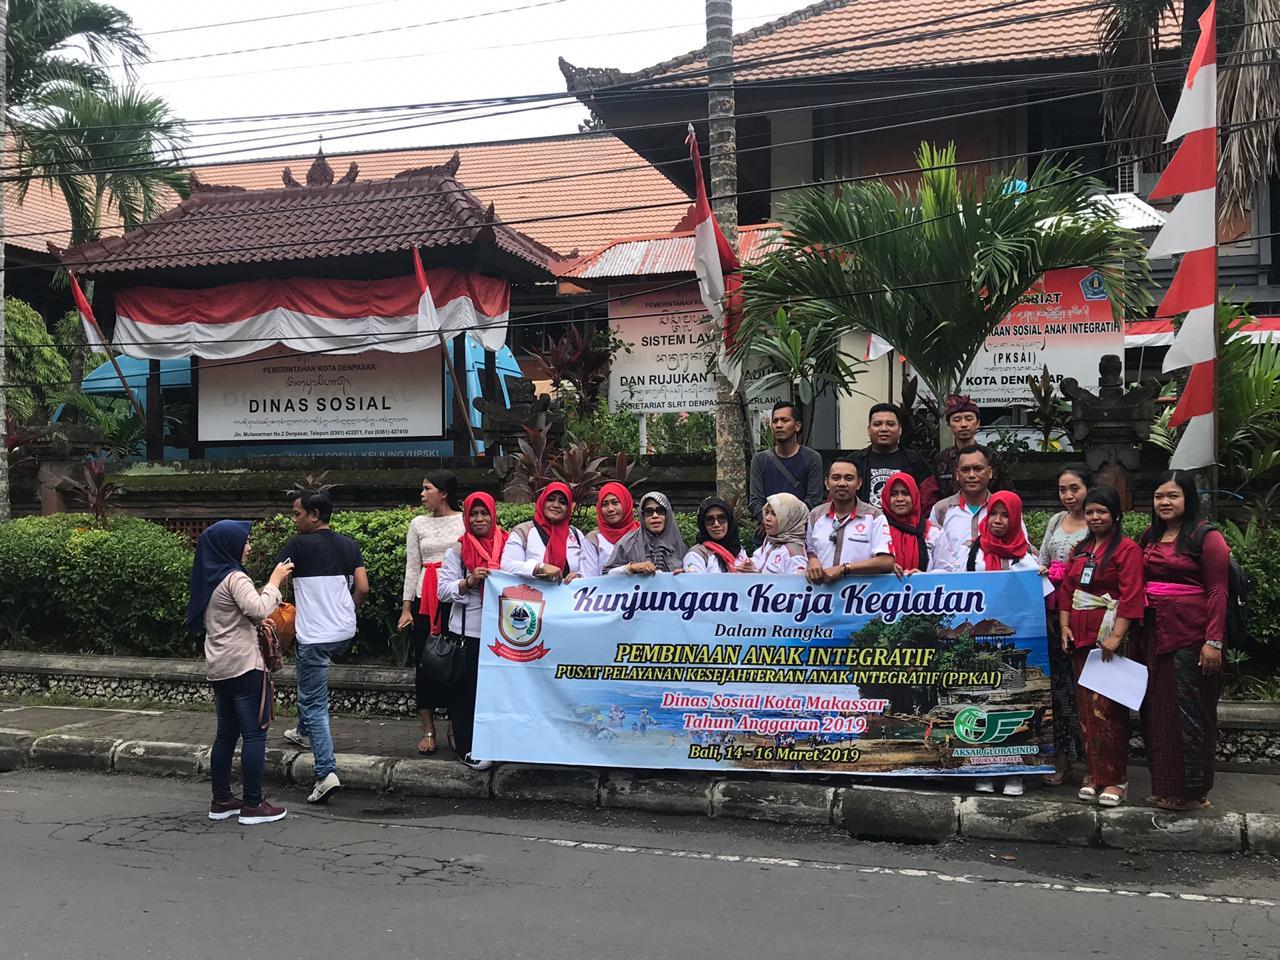 Dinsos Makassar Sharing Penanganan Masalah Sosial dengan Dinsos Denpasar